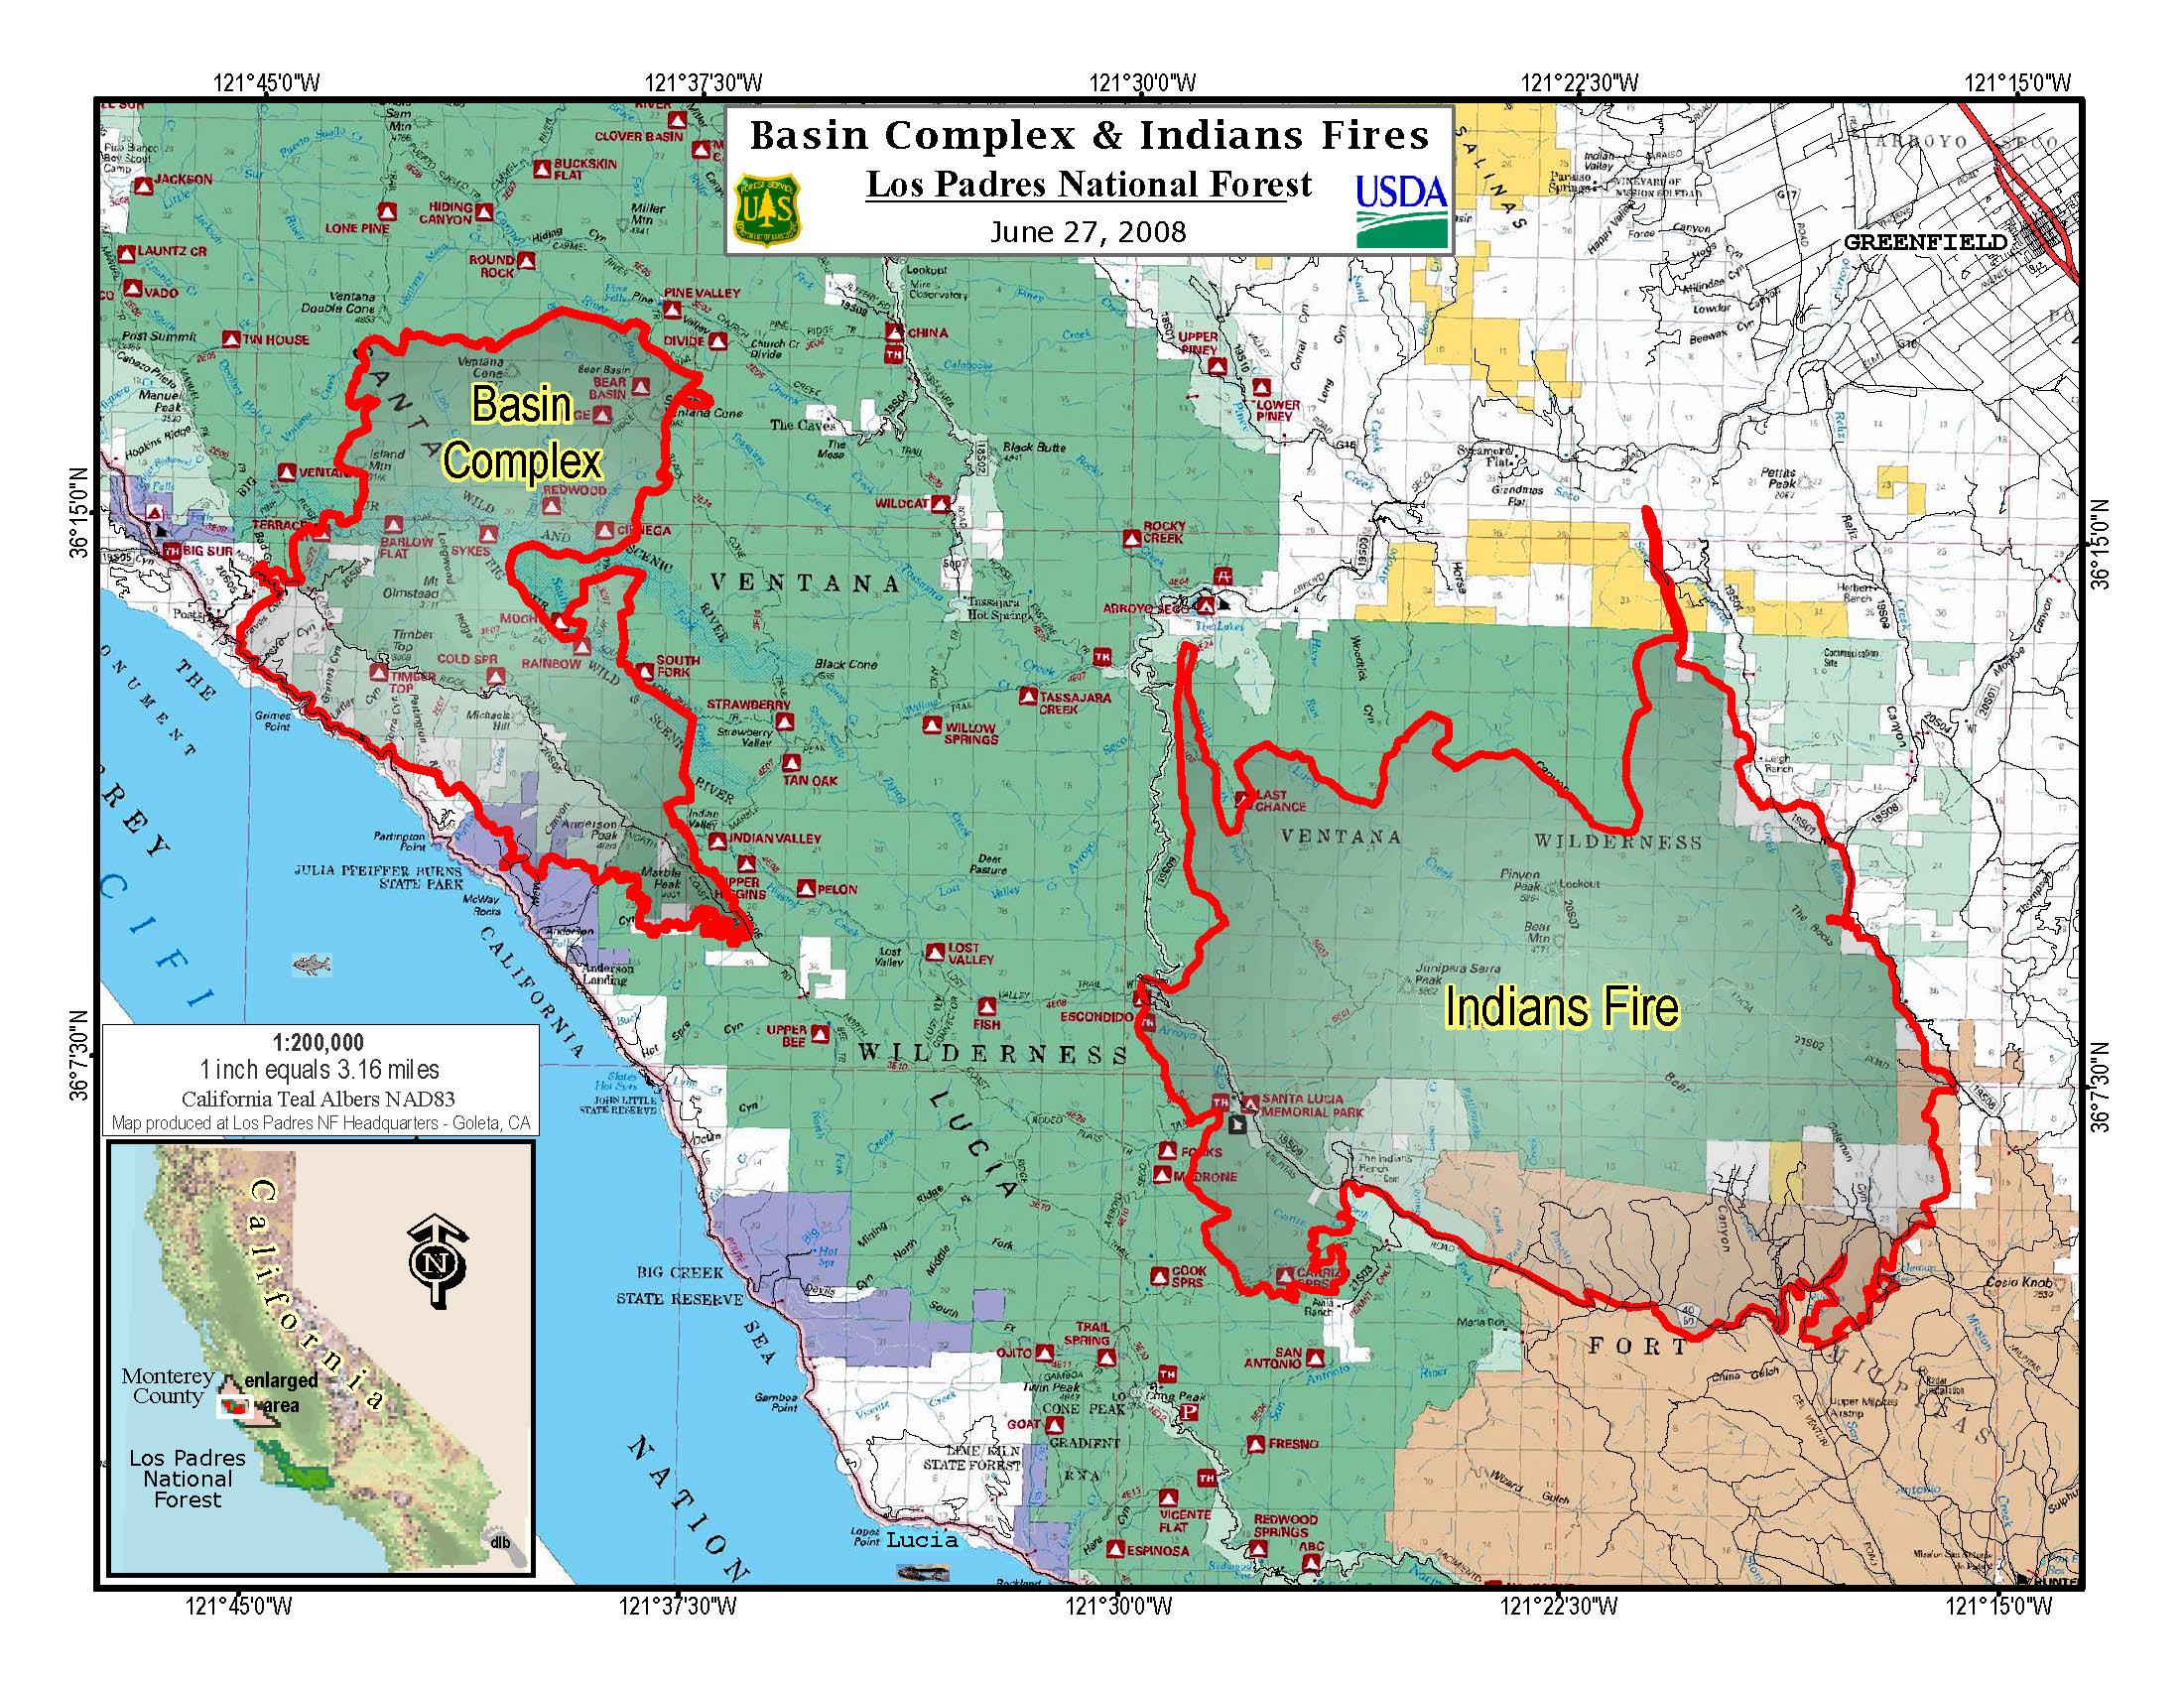 Cal Fire California Fire Hazard Severity Zone Map Update Project - California Fire Zone Map